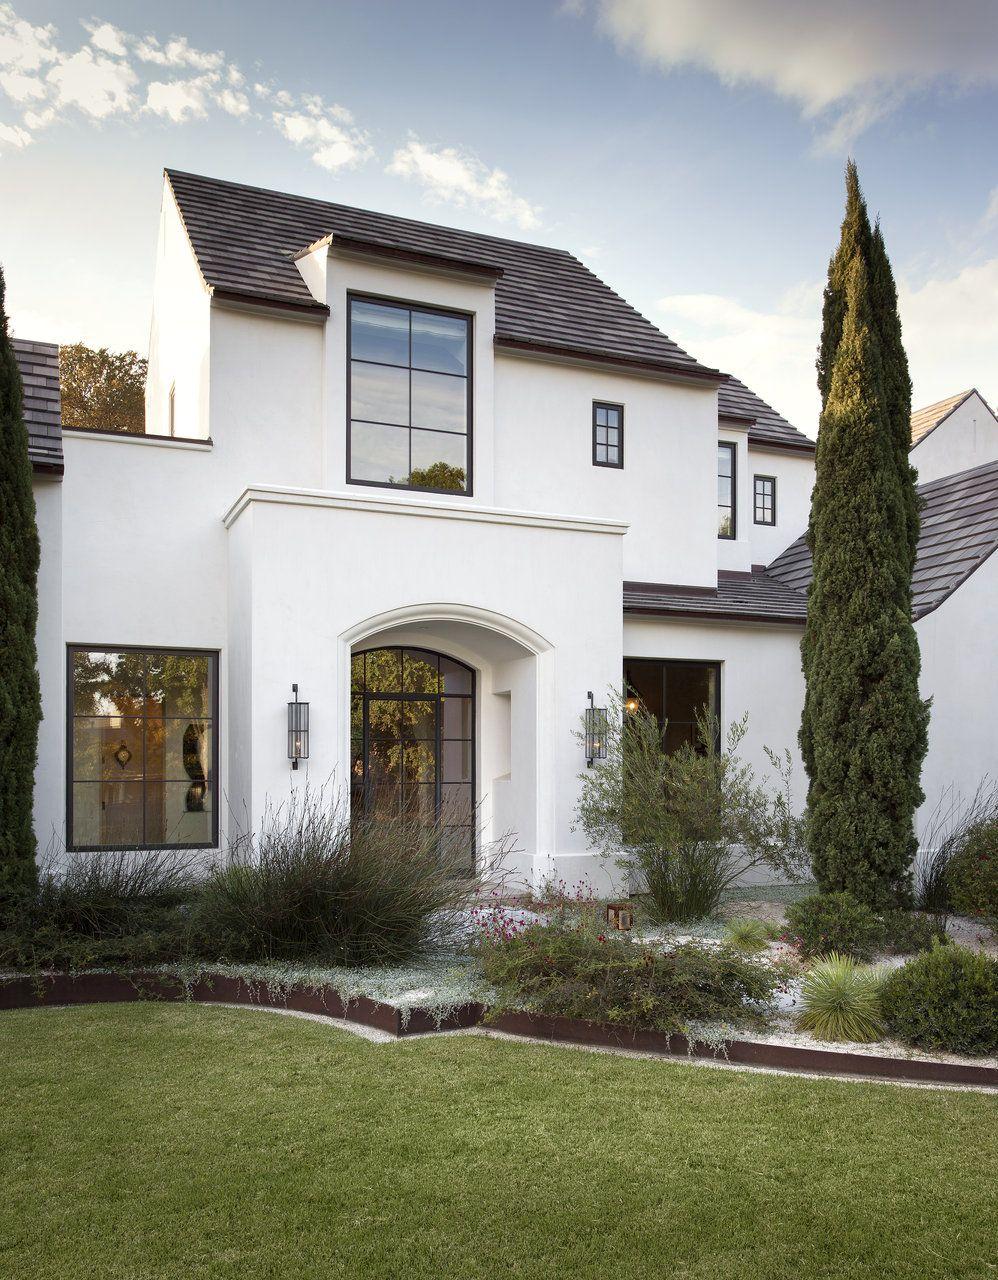 Black House White Windows with Stucco